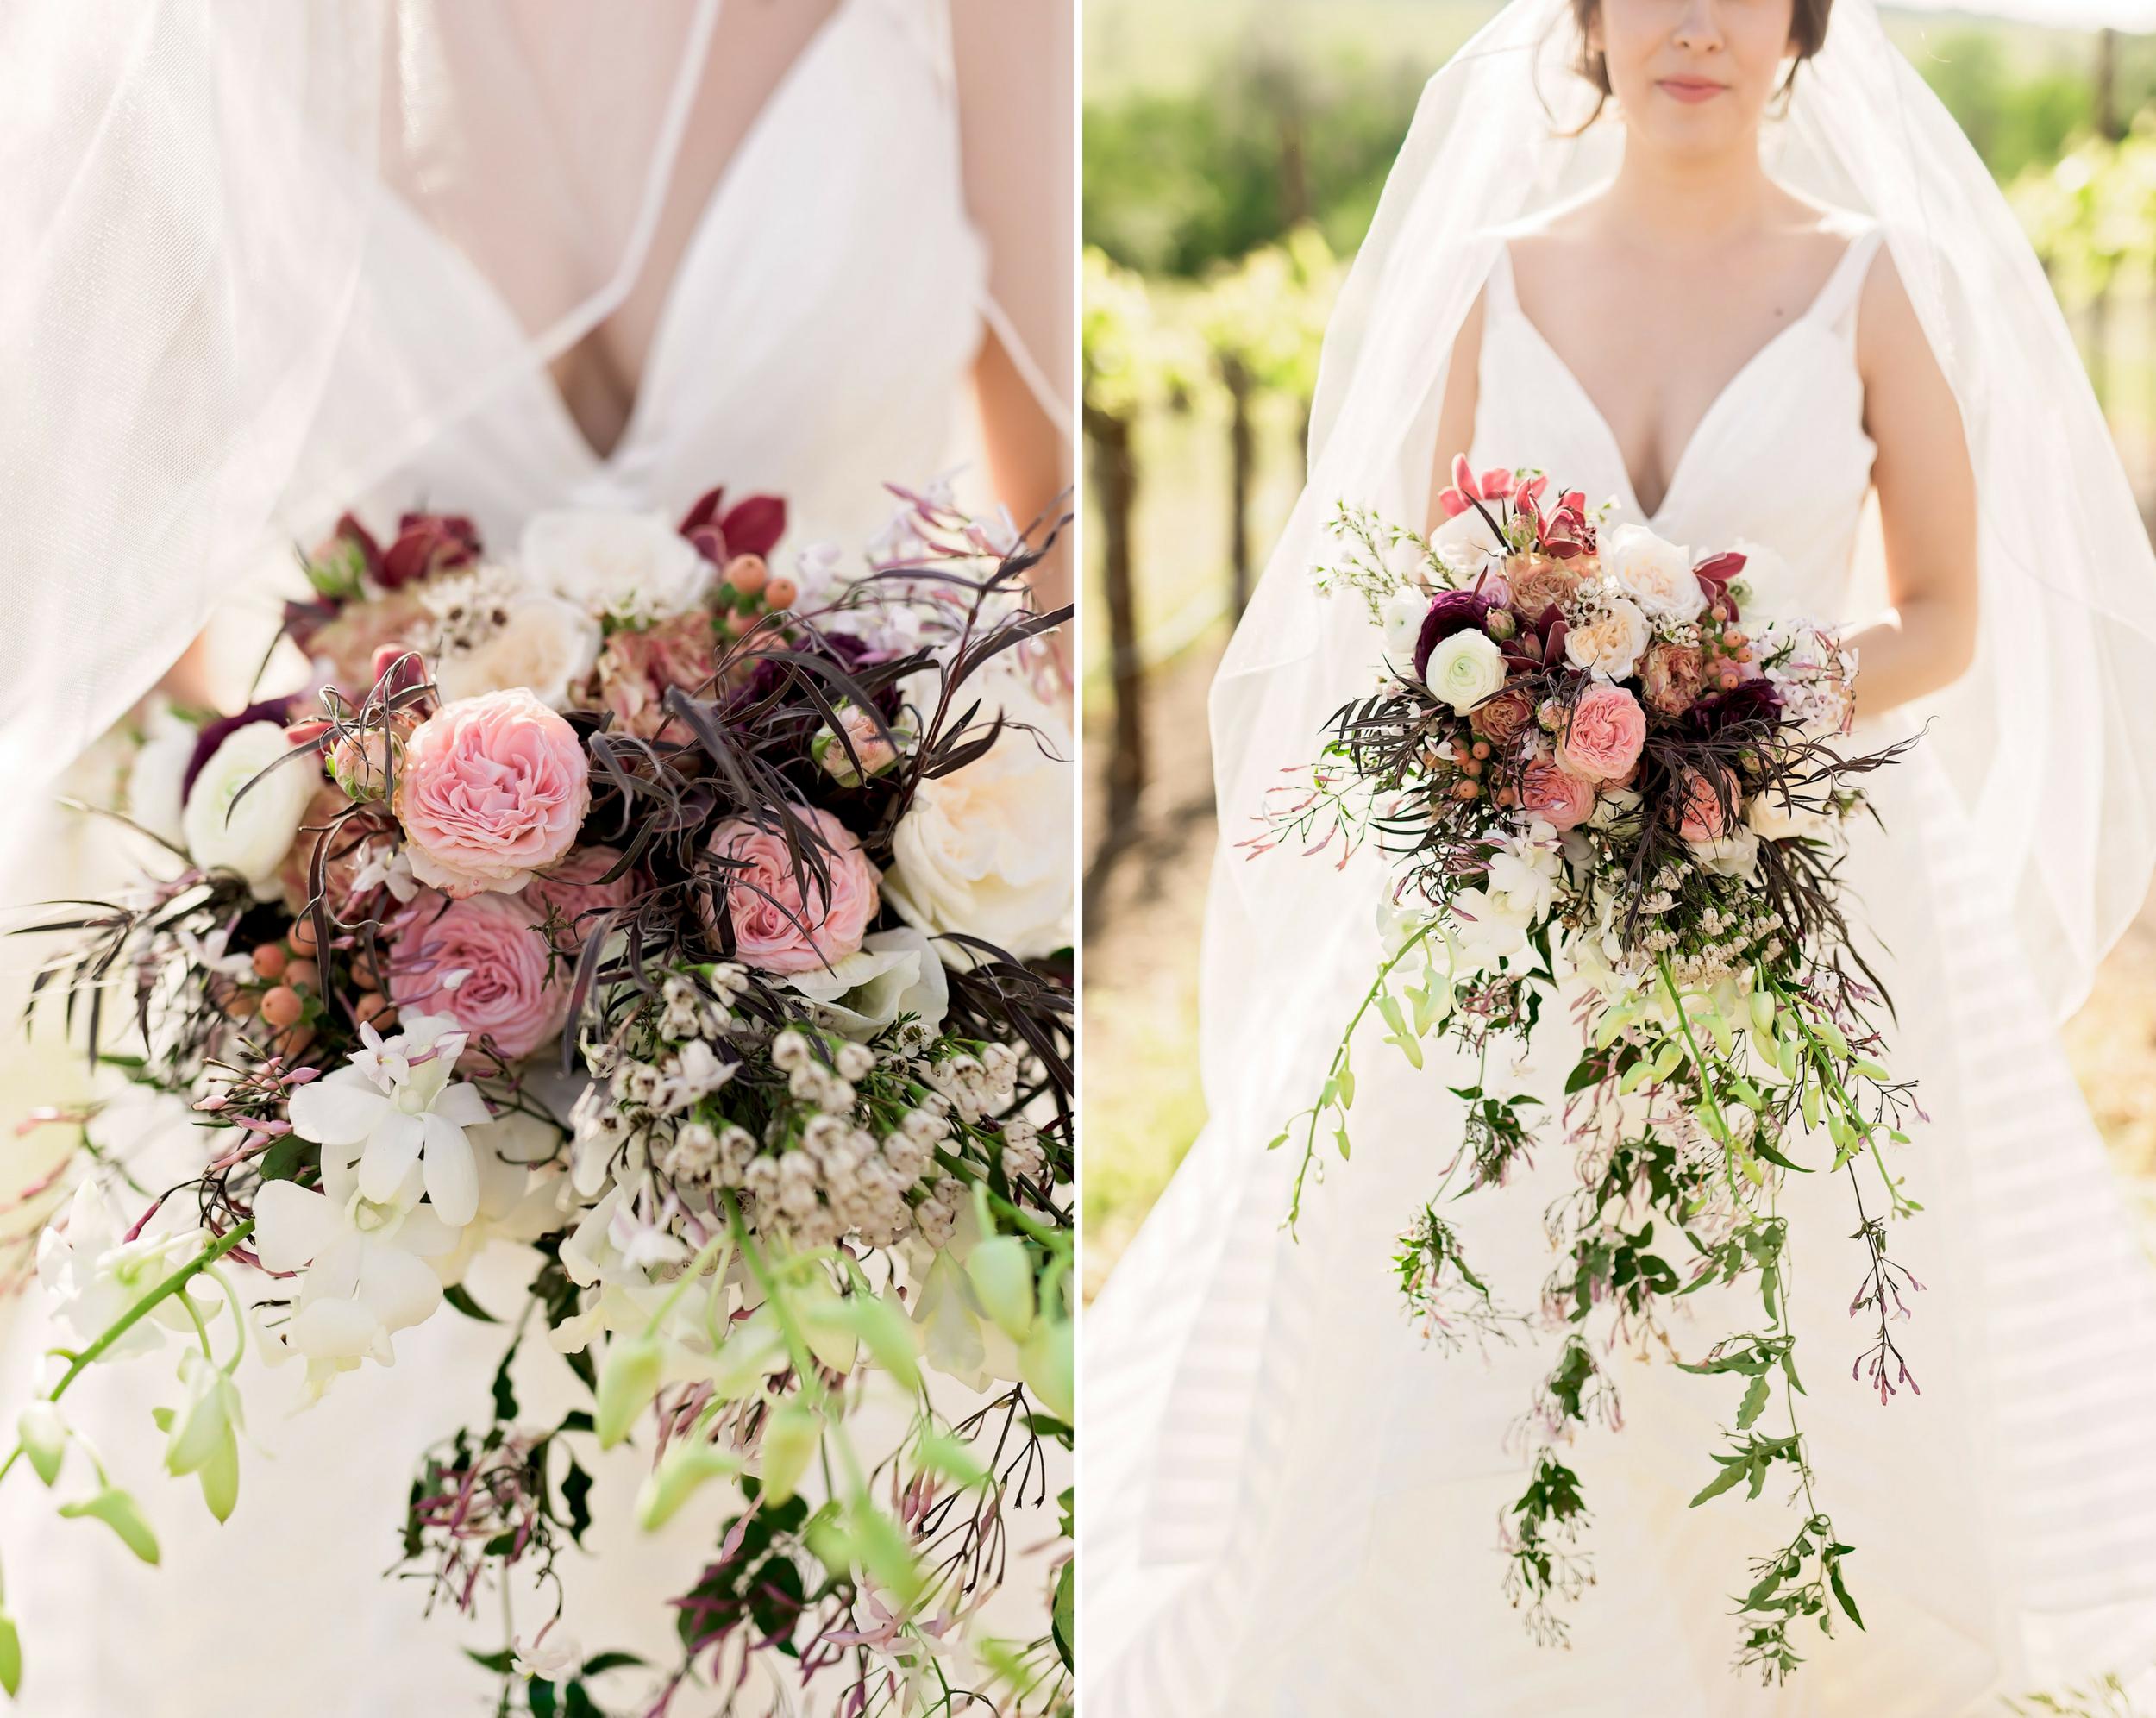 Rachel-Sergio-Wedding-Pharris-Photos-6.jpg